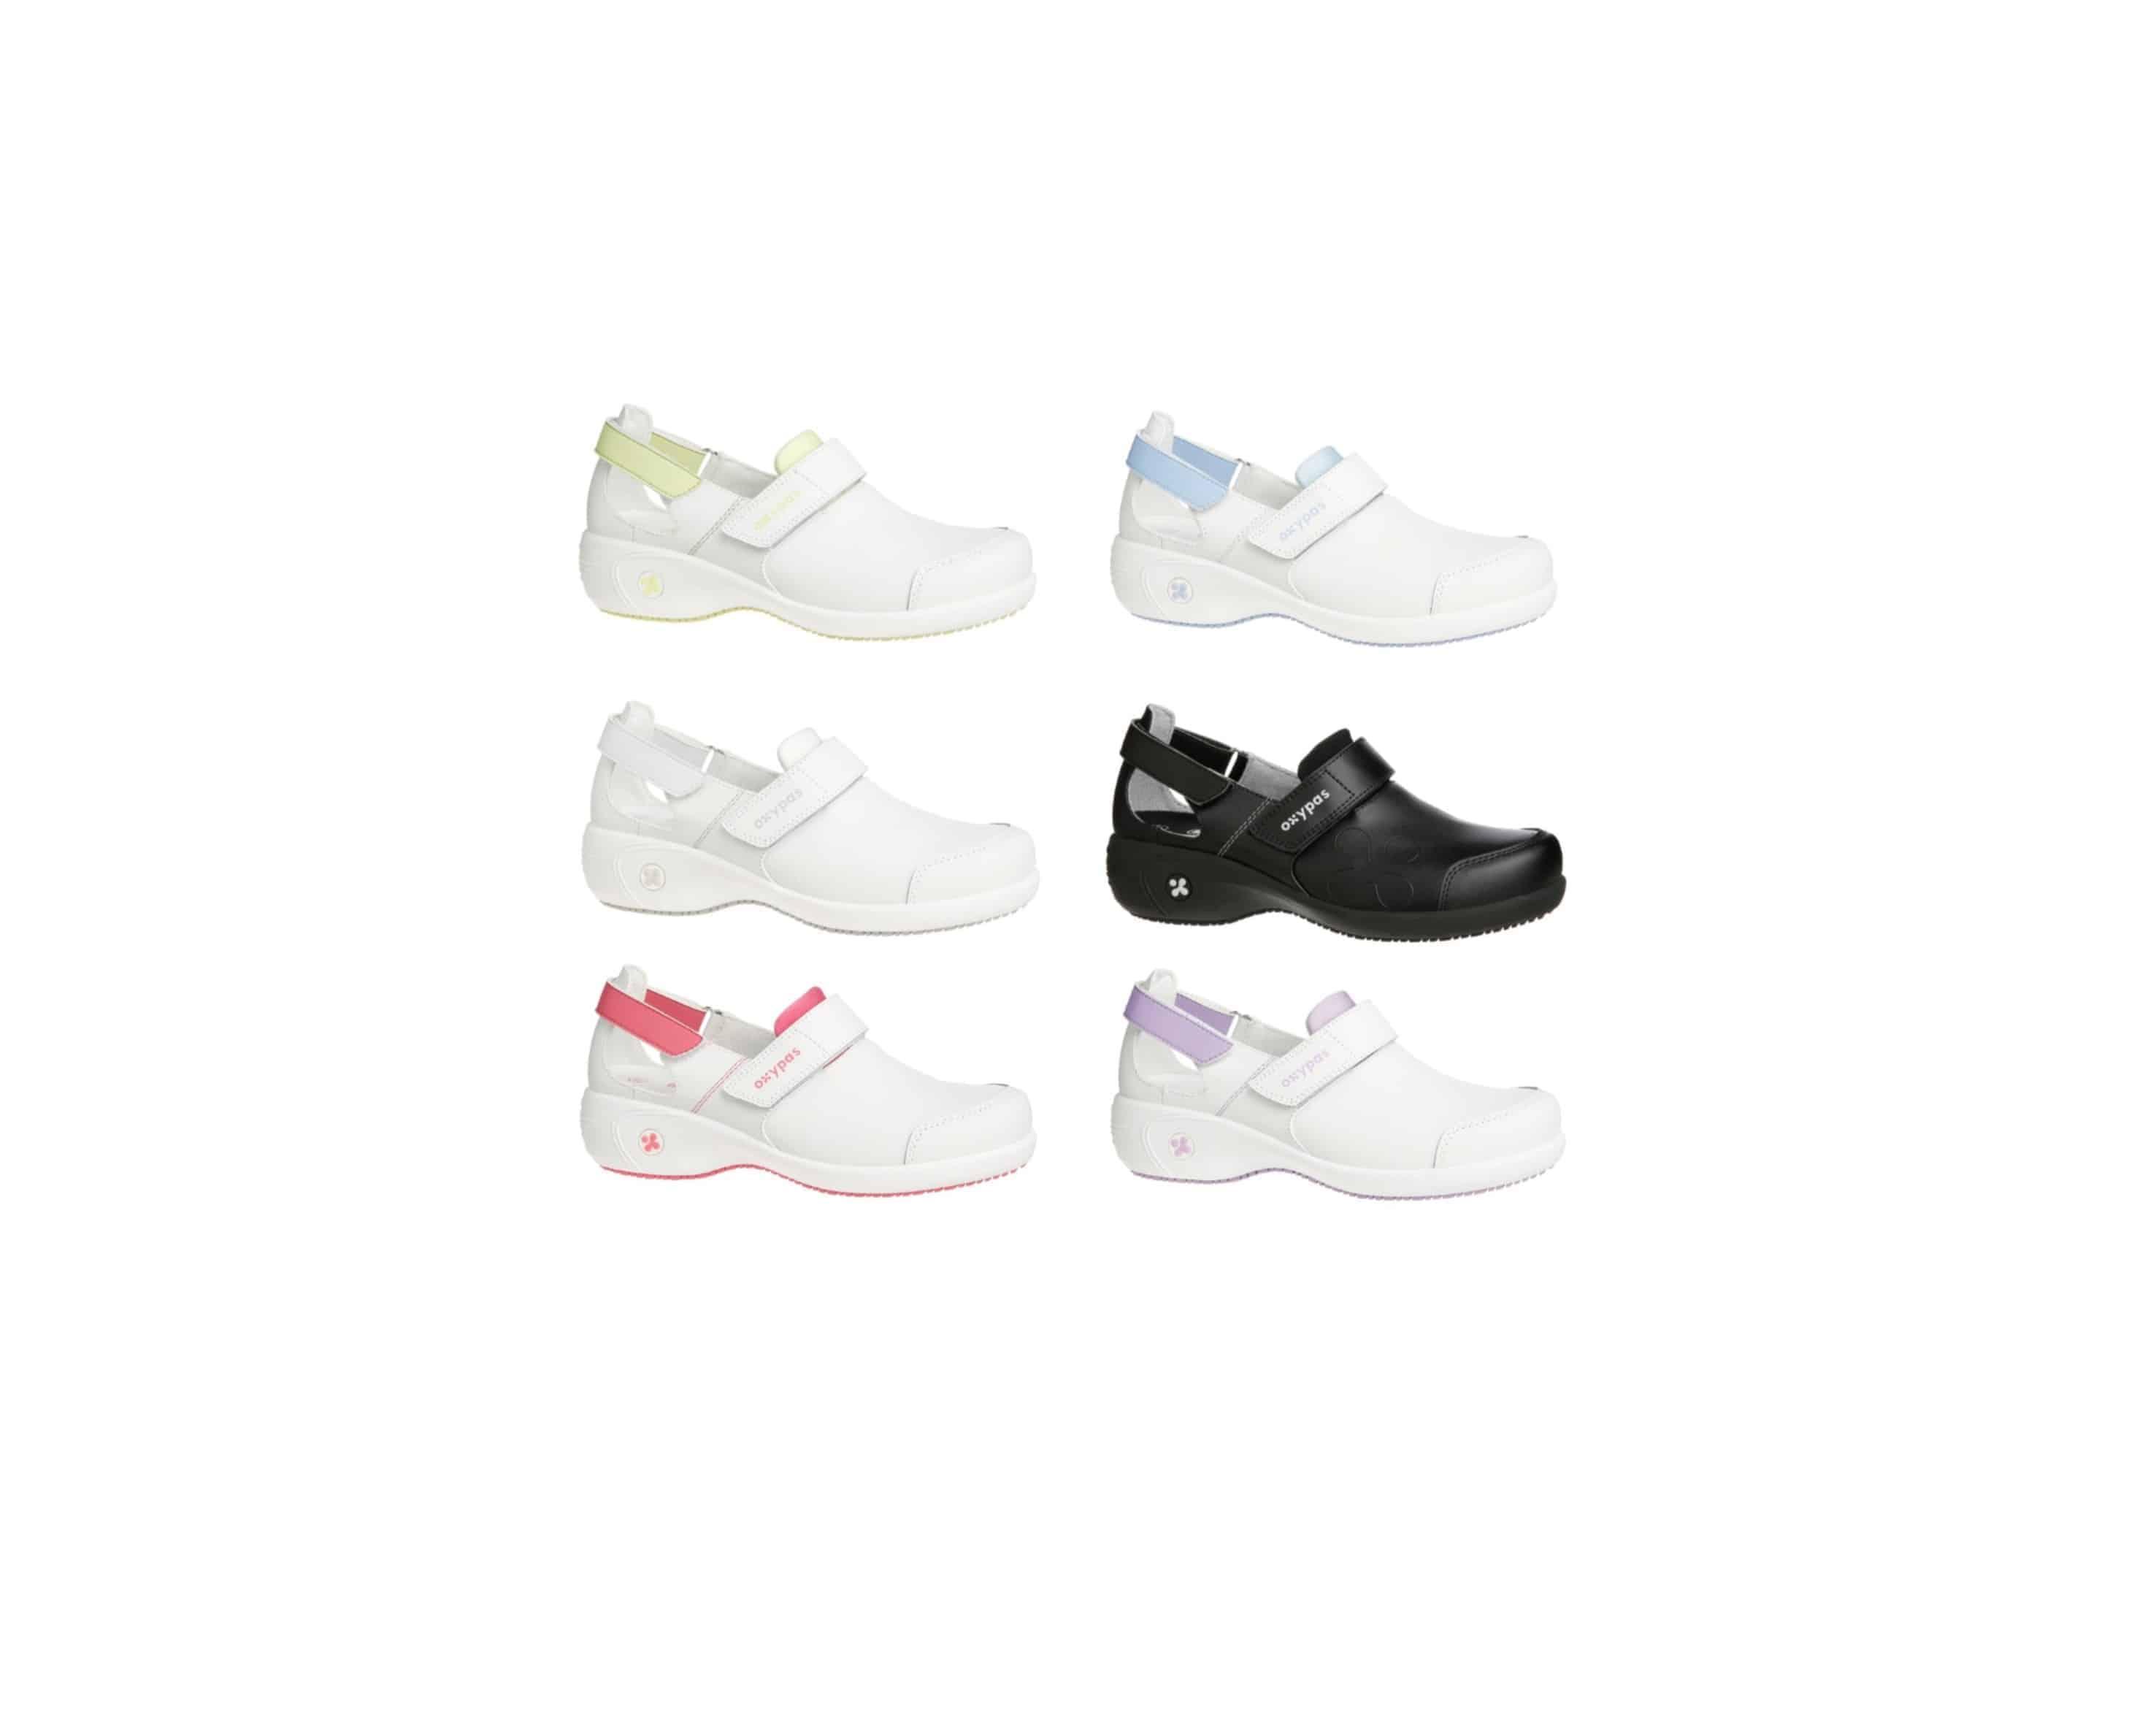 Oxypas Move Up Salma Leather Nursing Shoe